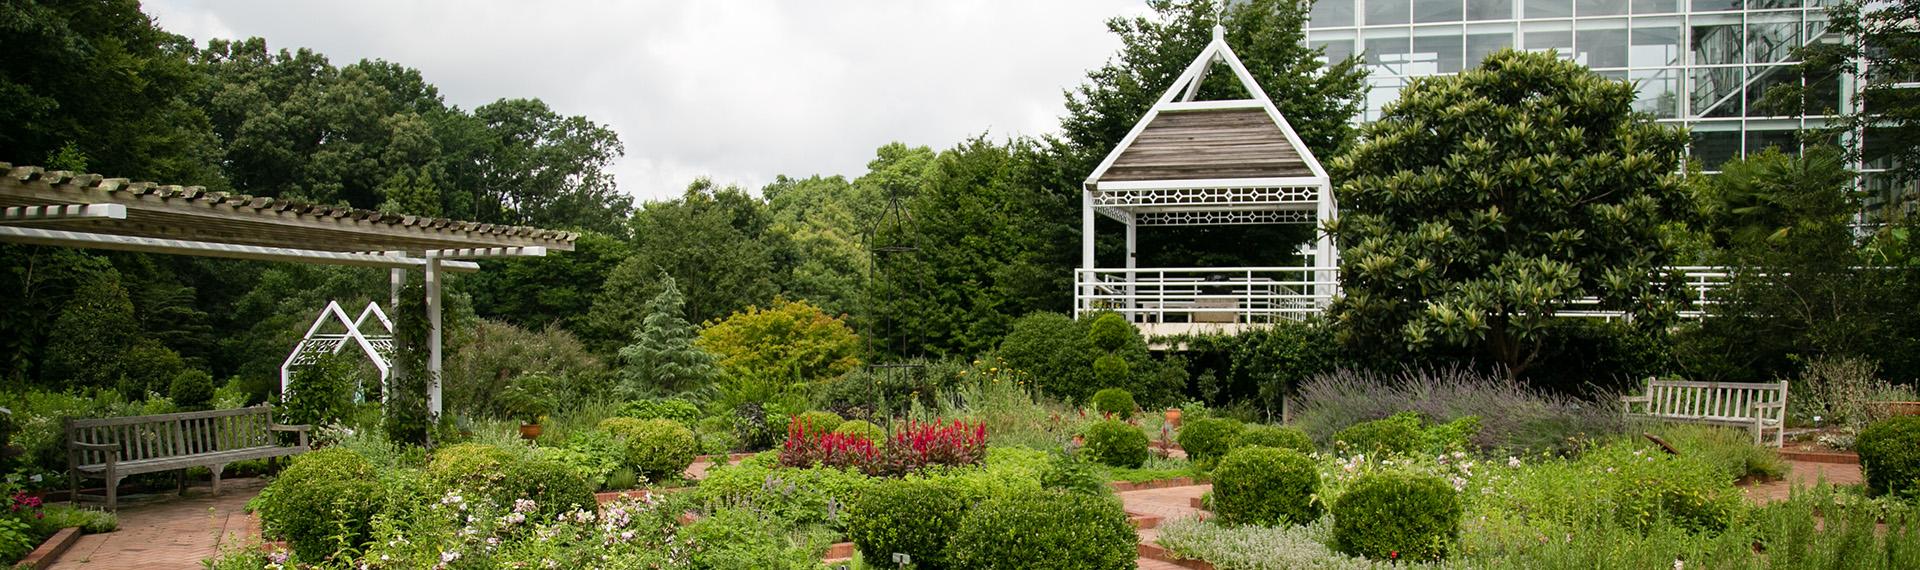 Botanical Gardens early summer